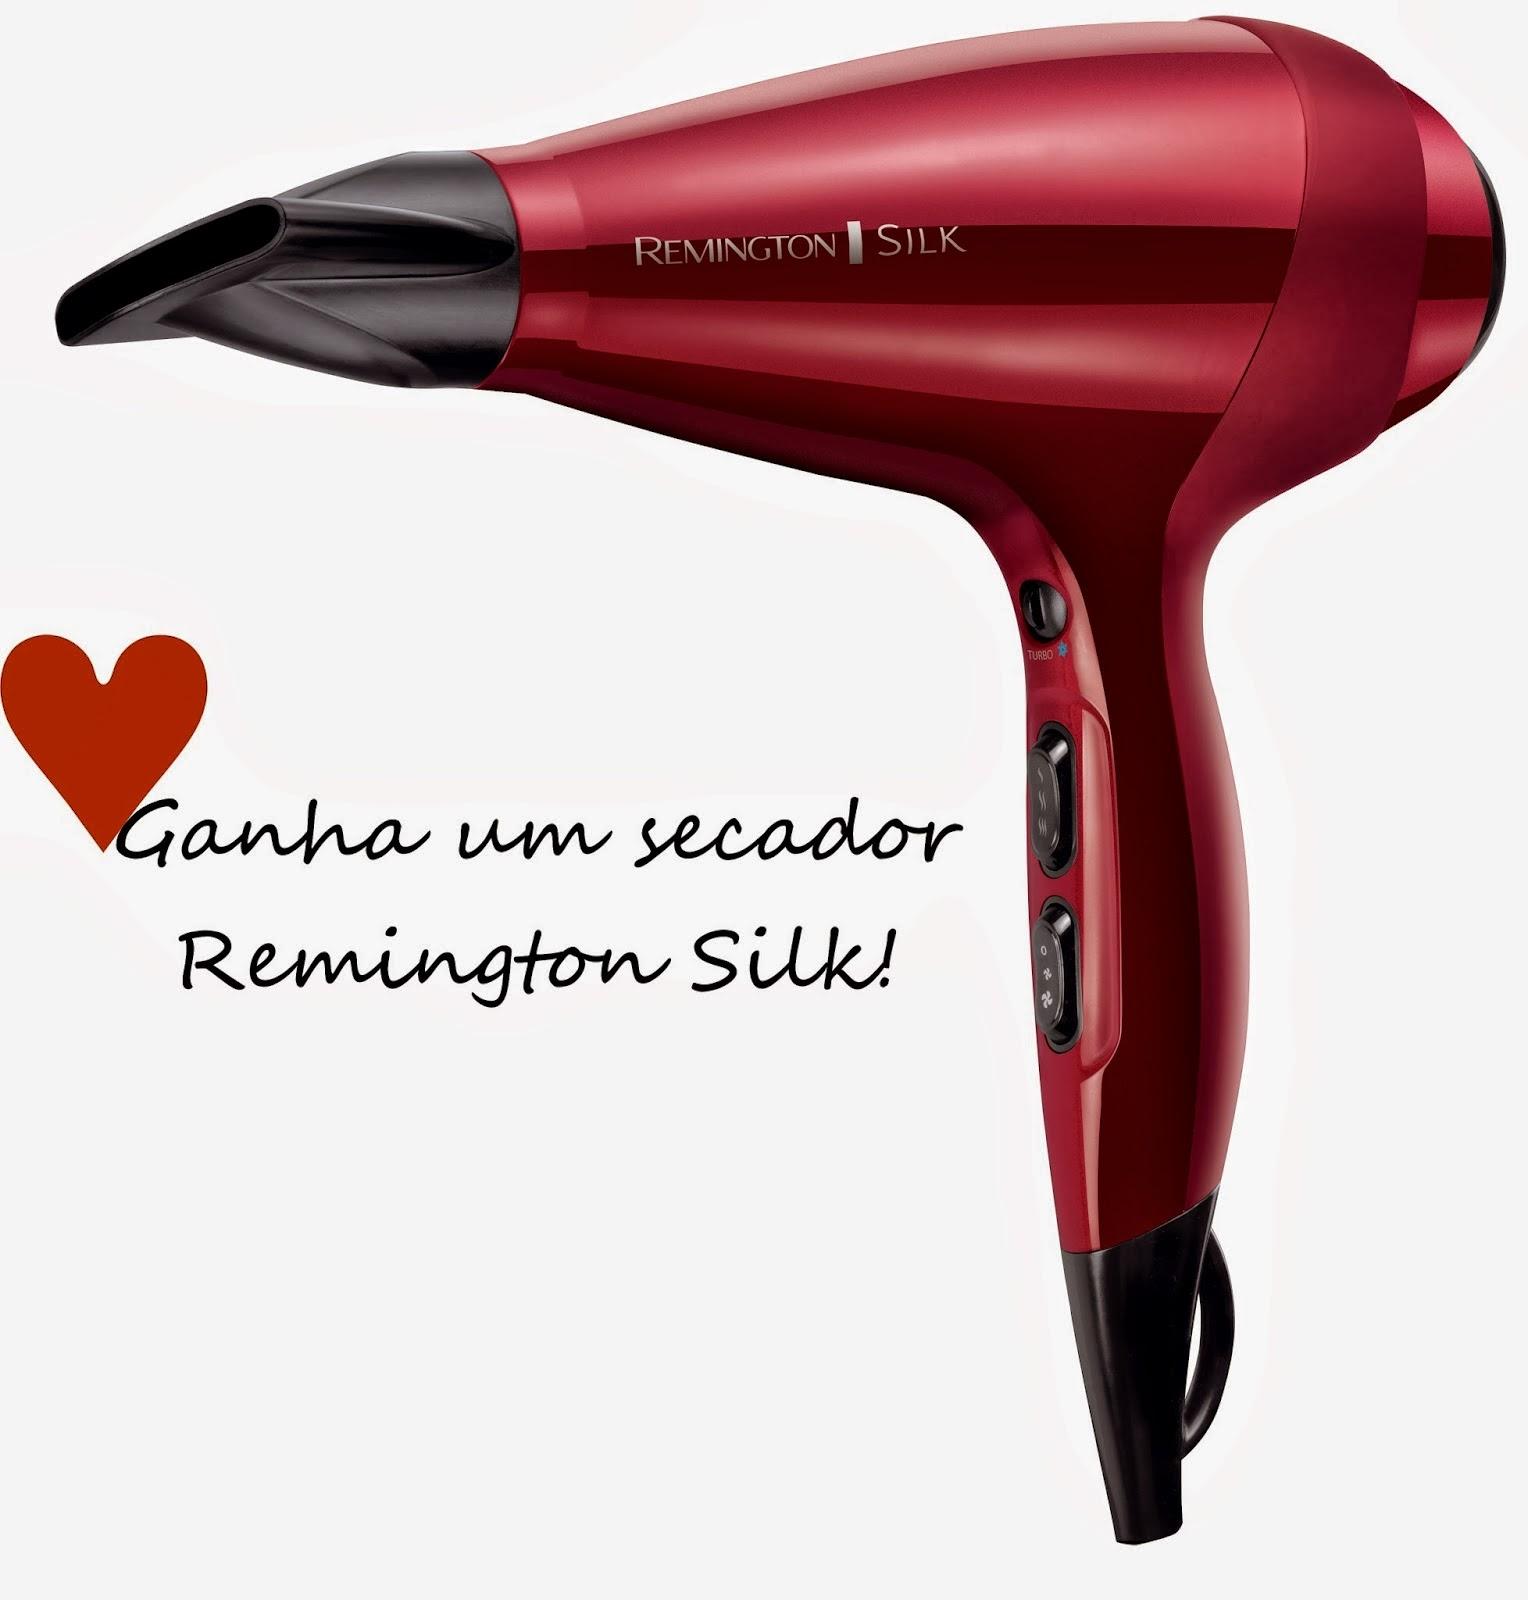 http://www.perturbacoesdeamor.com/2014/02/passatempo-remington-silk.html